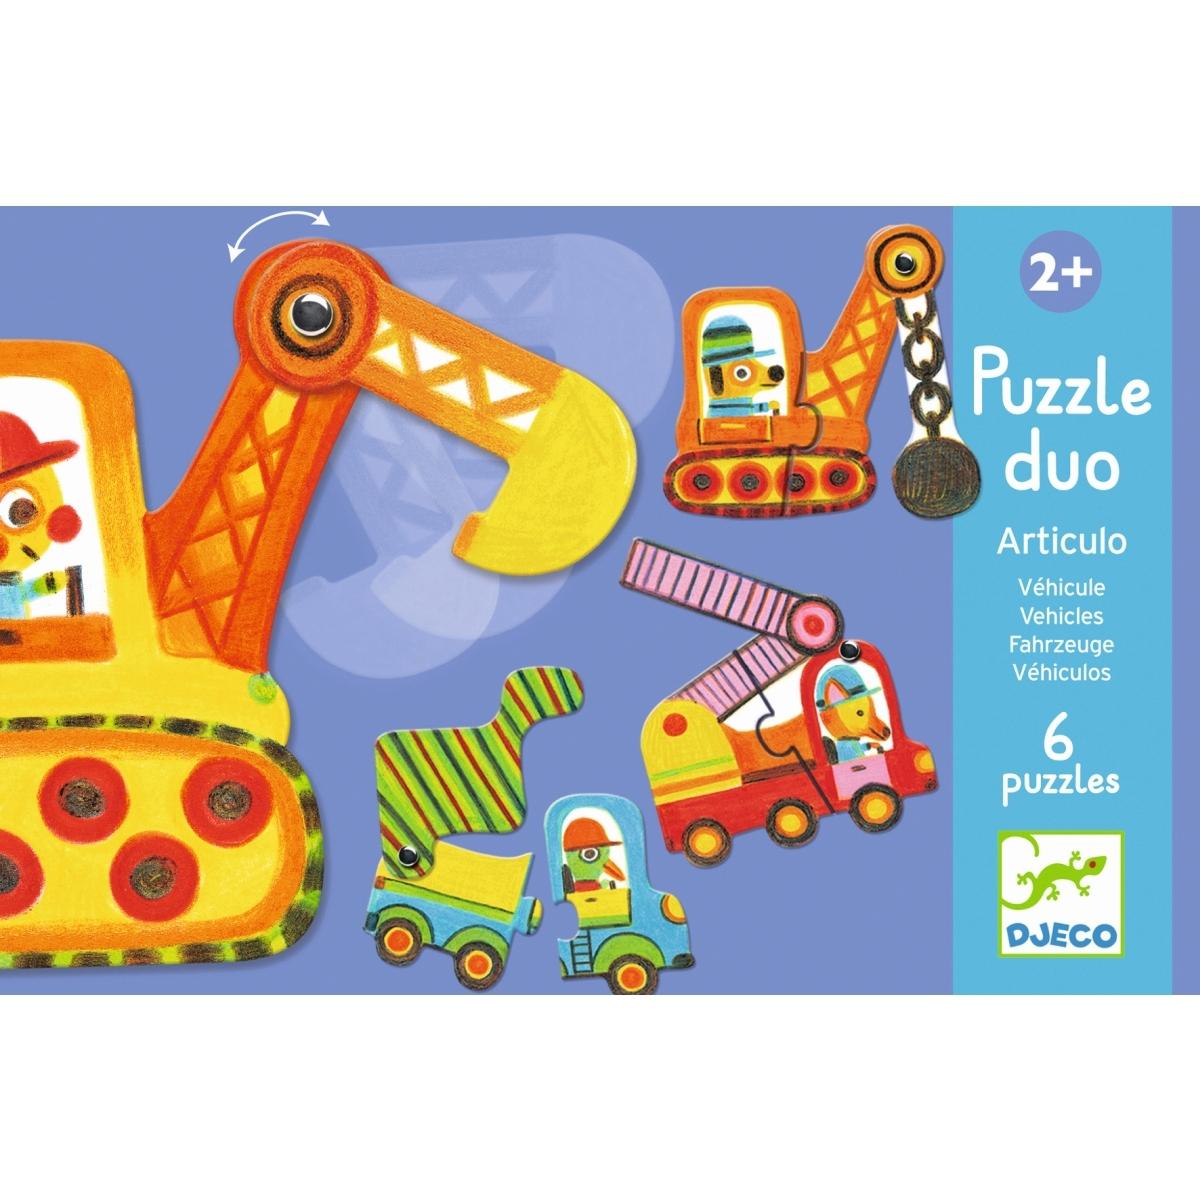 Djeco - Puzzle Duo Fahrzeuge